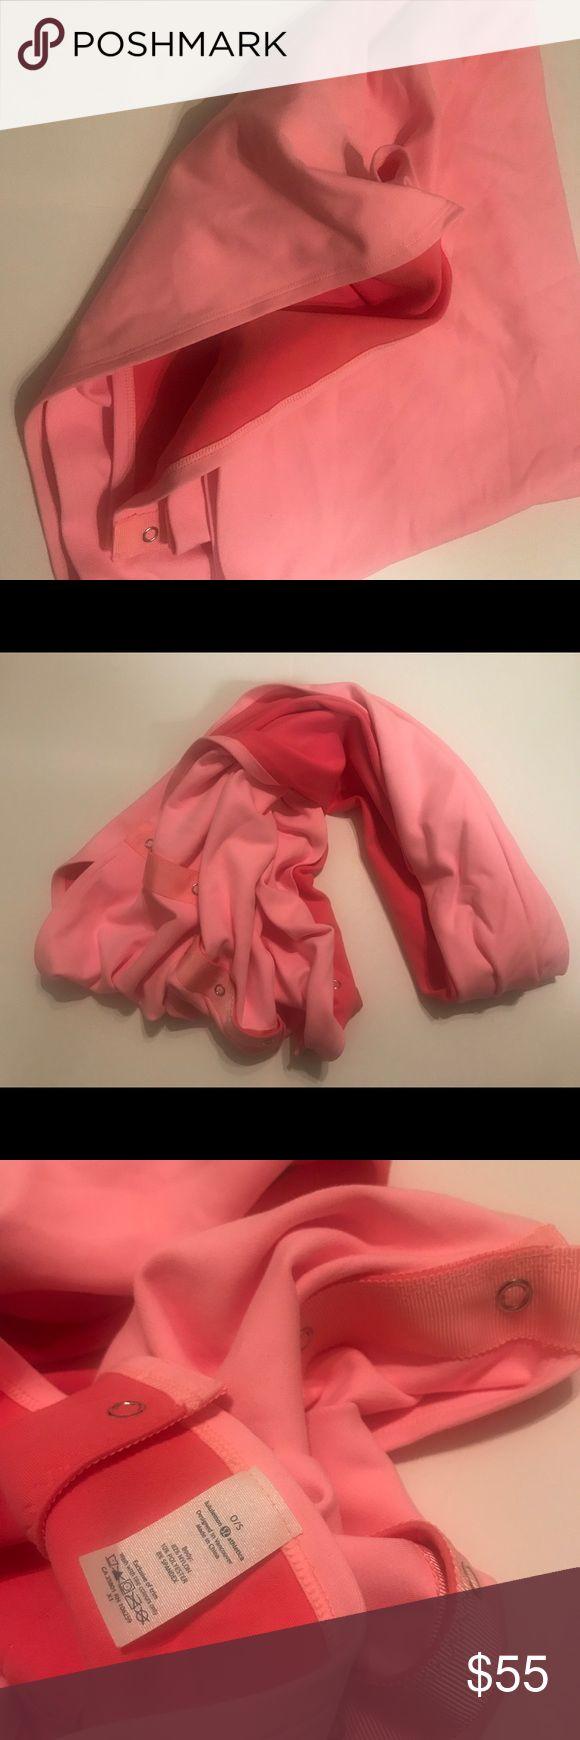 Lululemon vinyasa guava lava bleached coral scarf Excellent condition, rarely used! lululemon athletica Accessories Scarves & Wraps